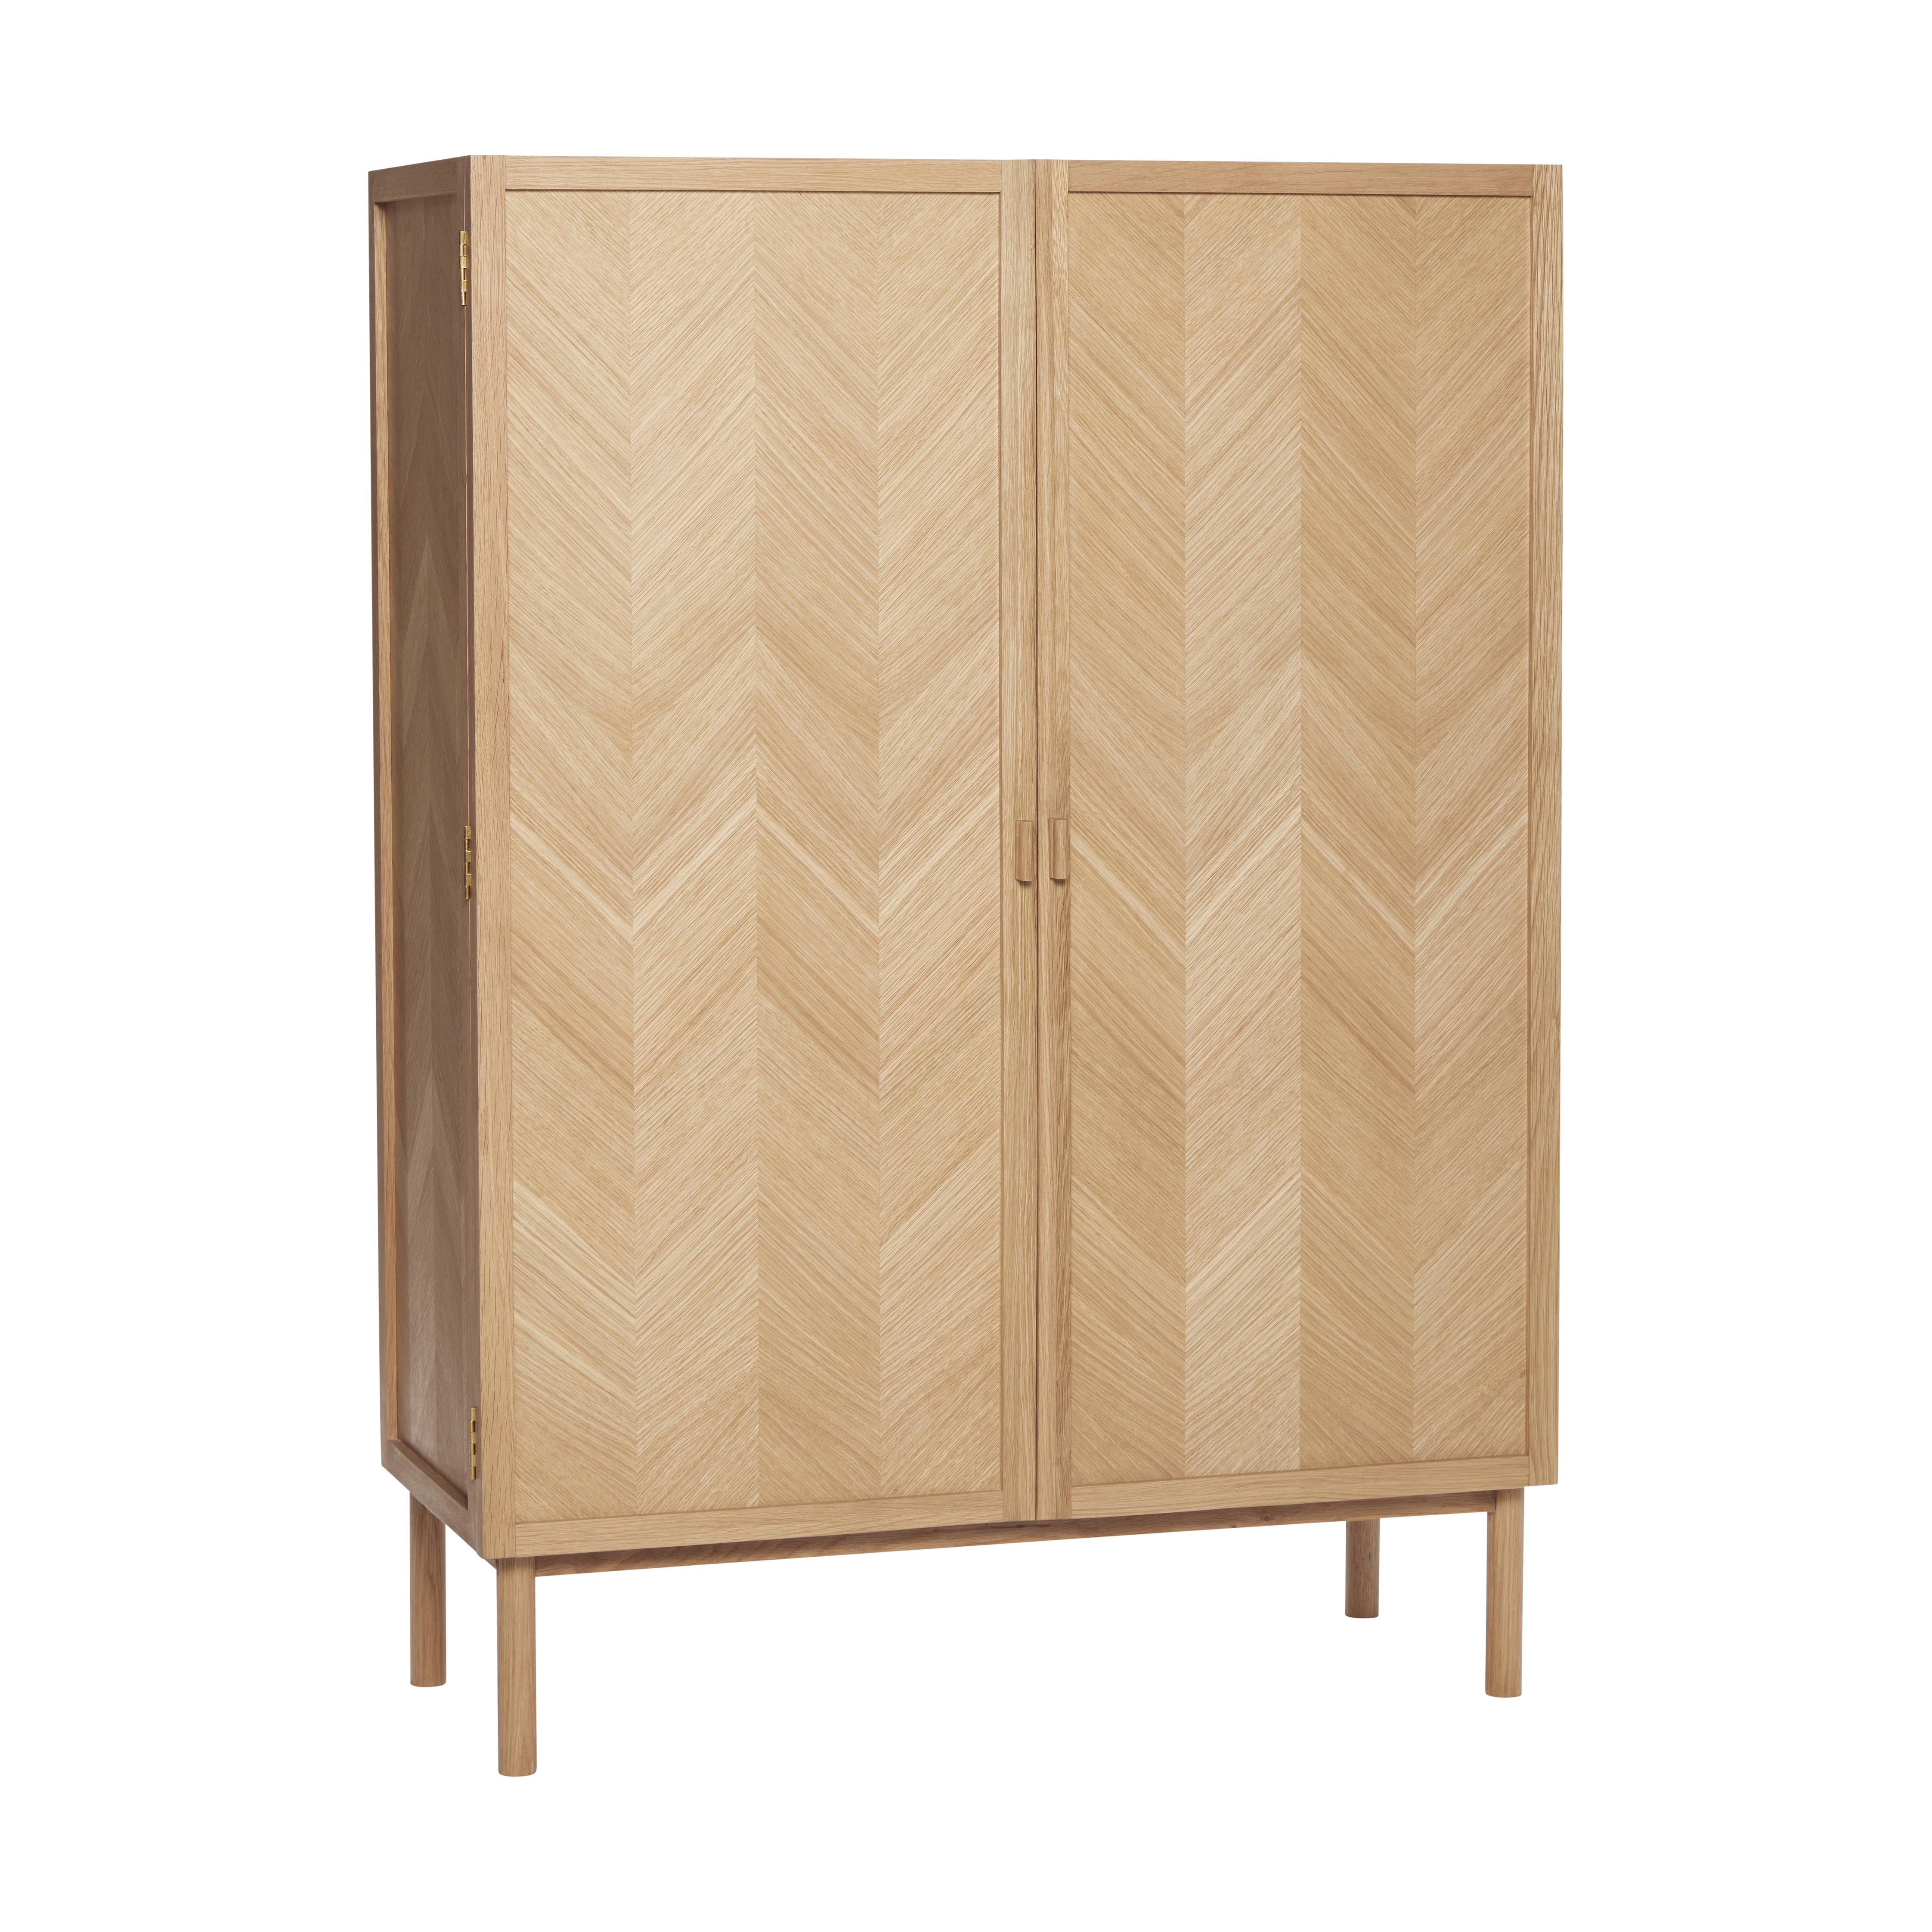 Cabinet, oak, herringbone, nature - Hübsch.